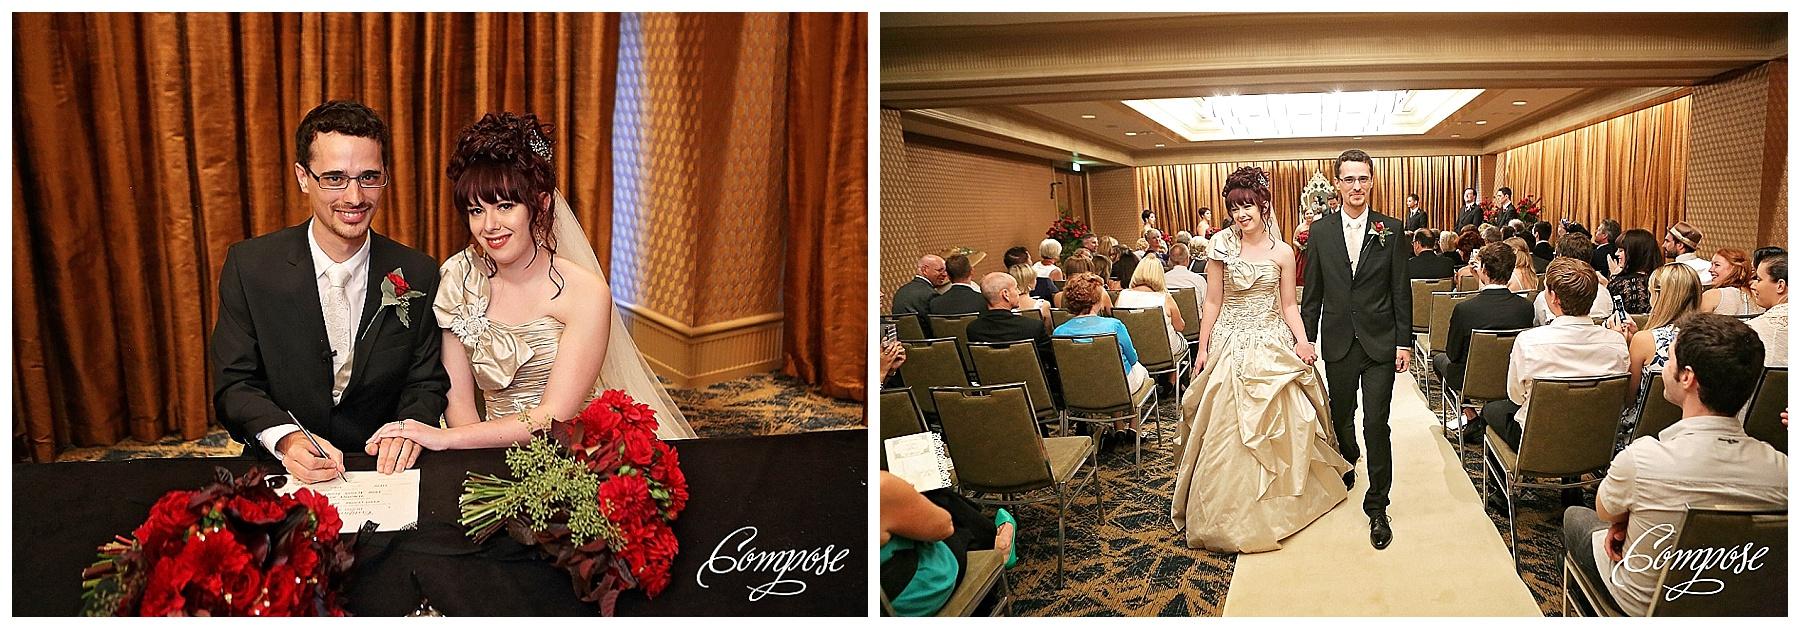 Hyatt Perth wedding